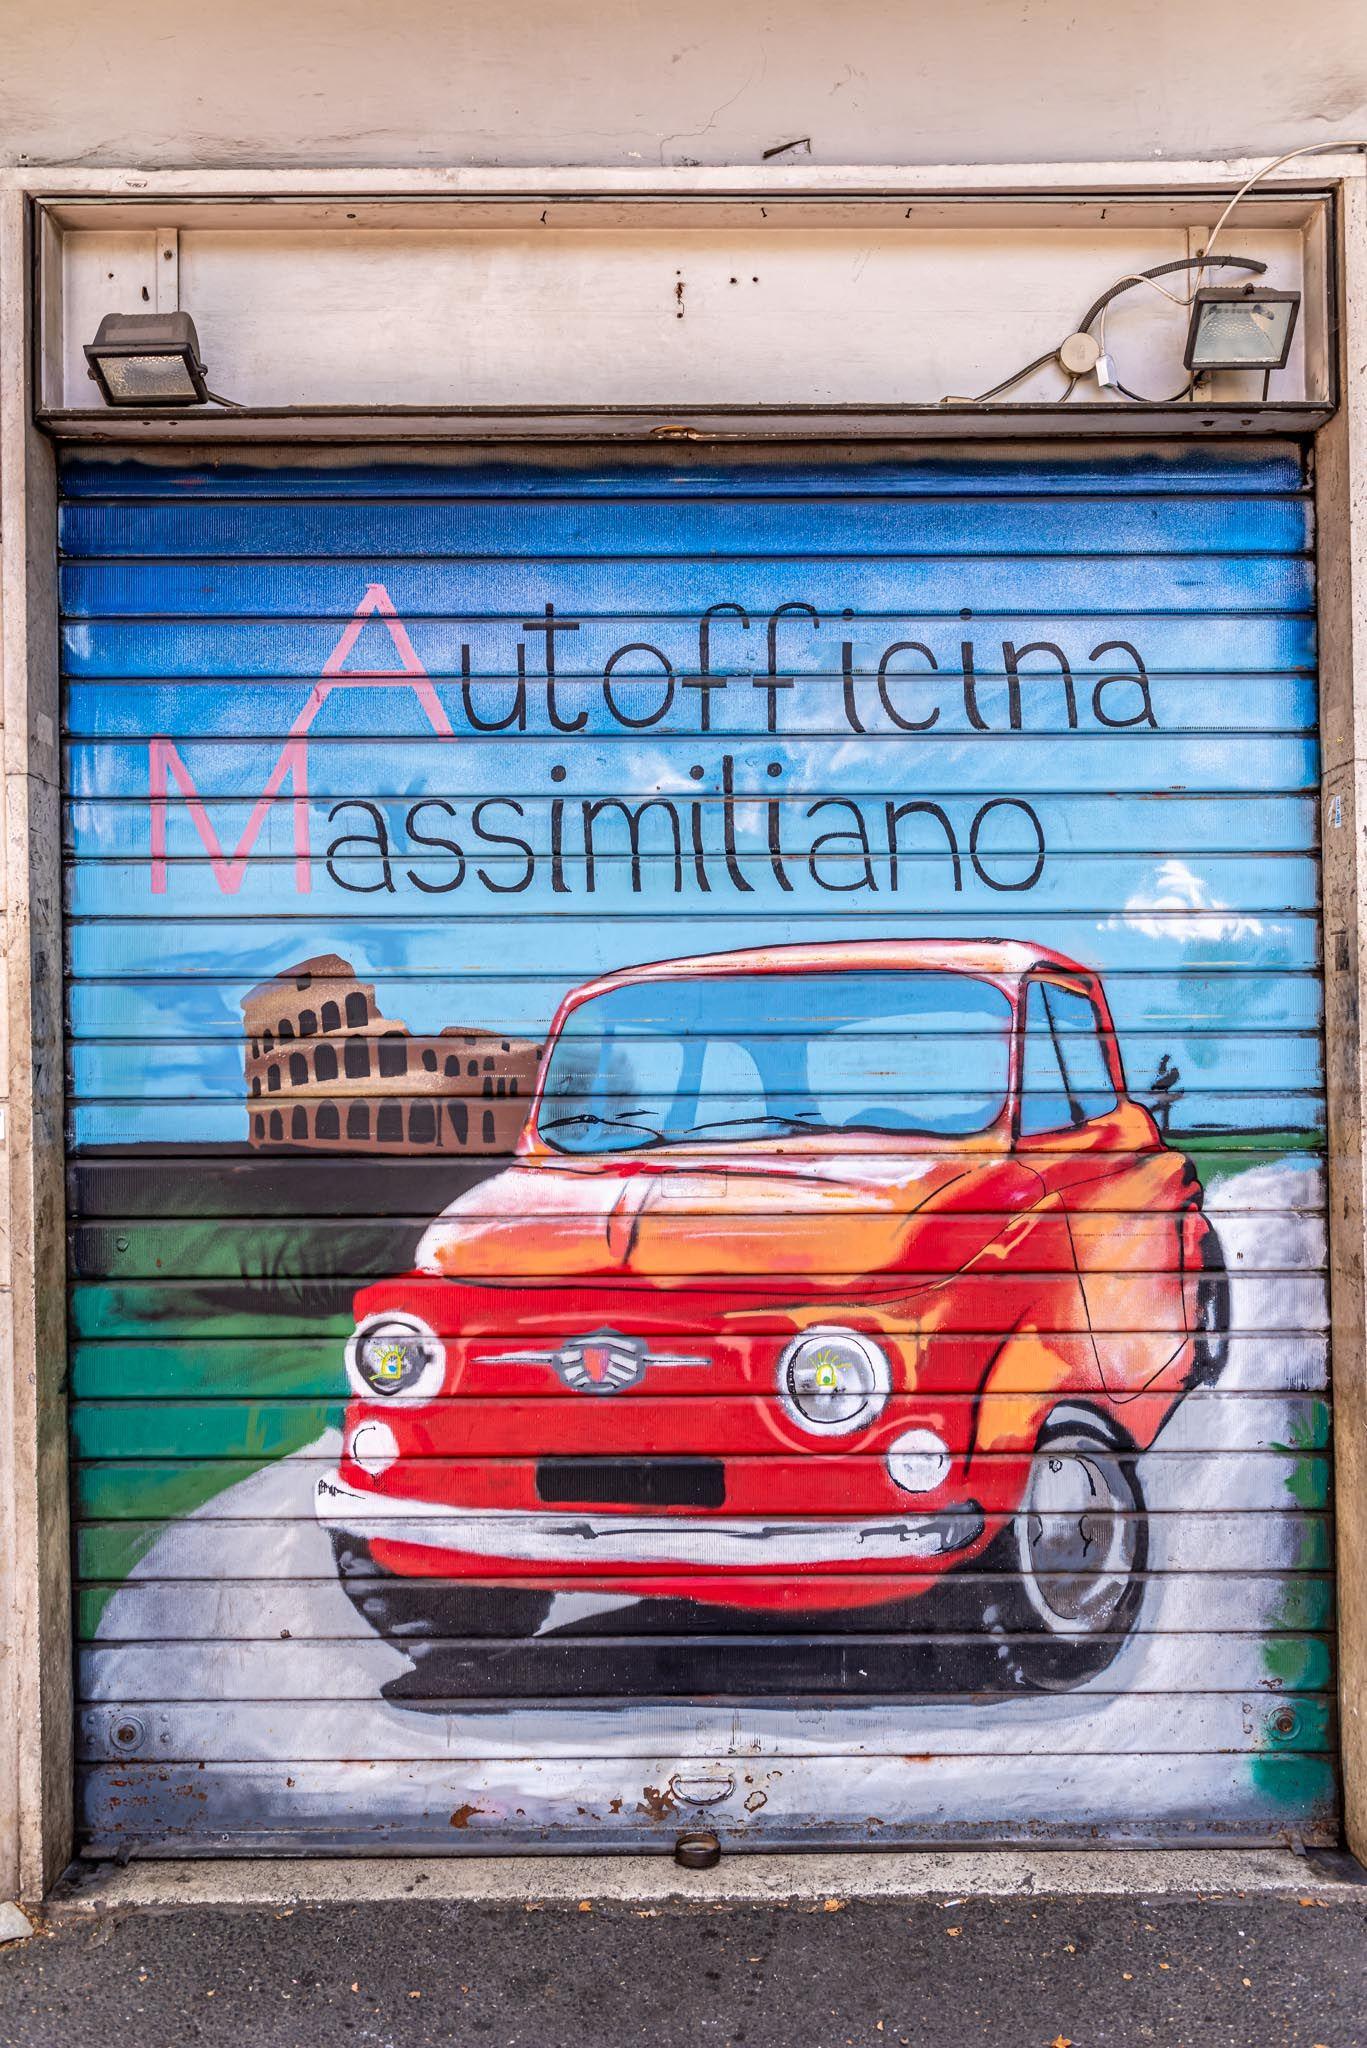 Autofficina Massimiliano